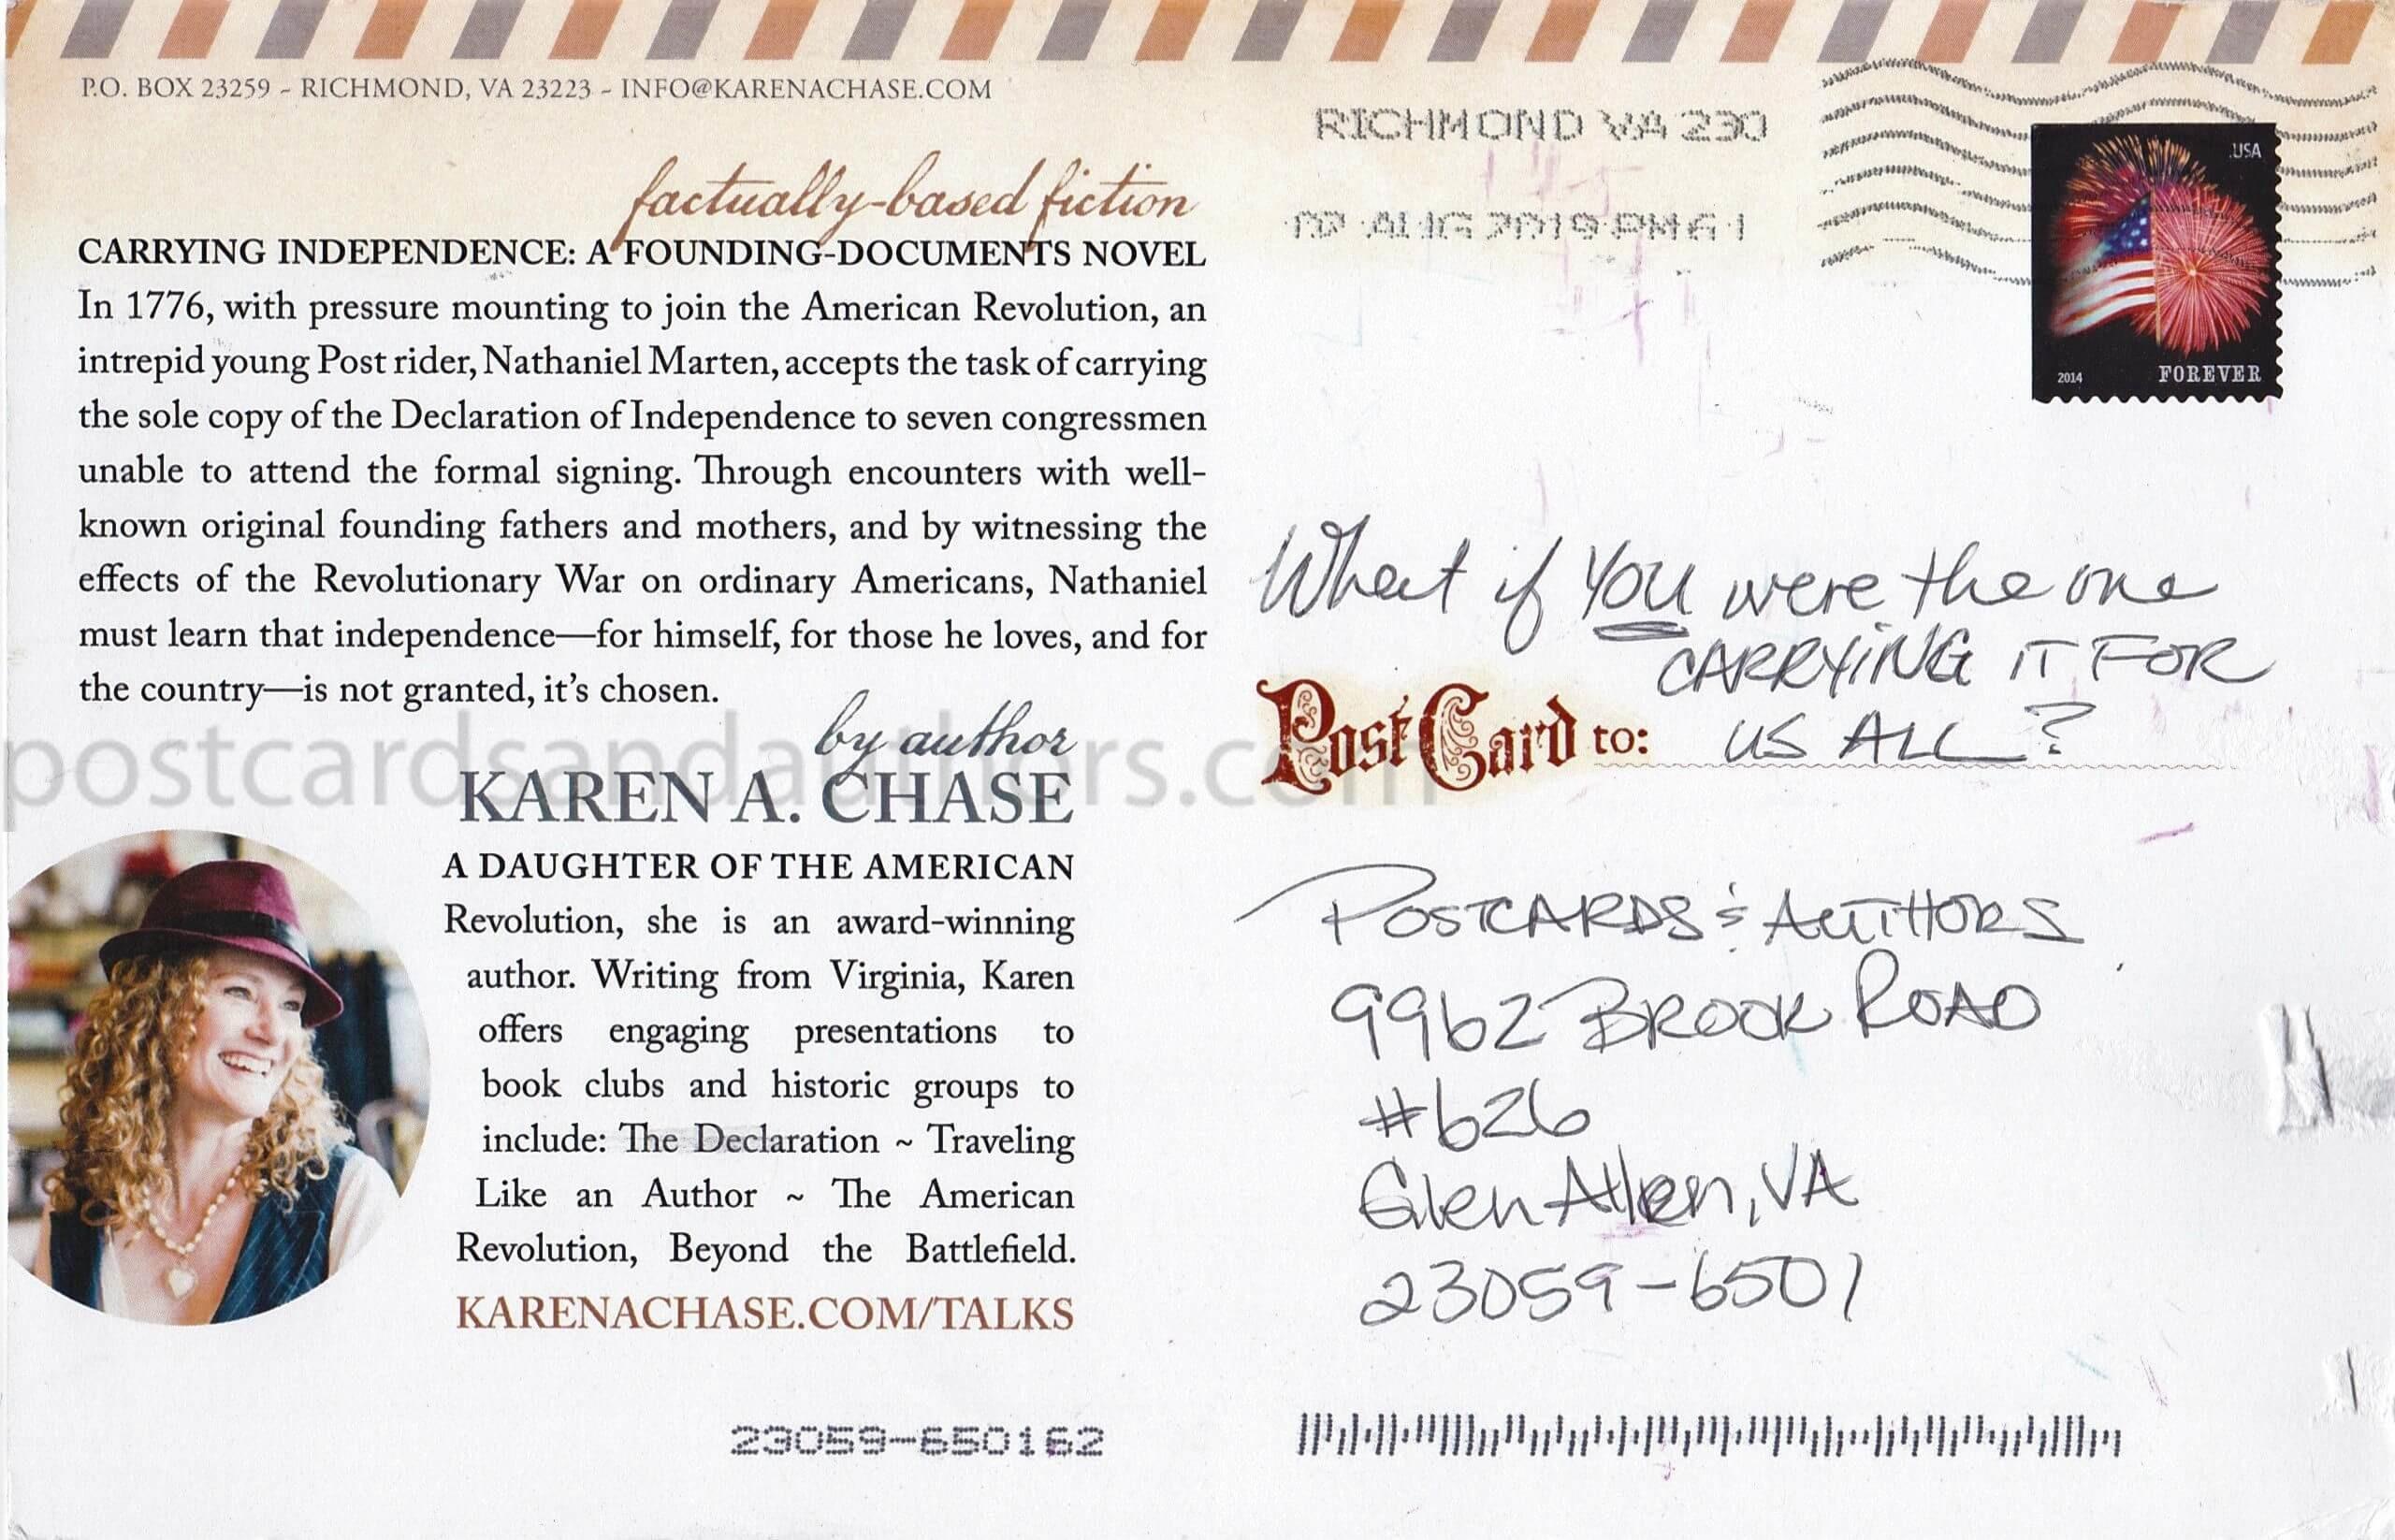 Karen A. Chase 1T